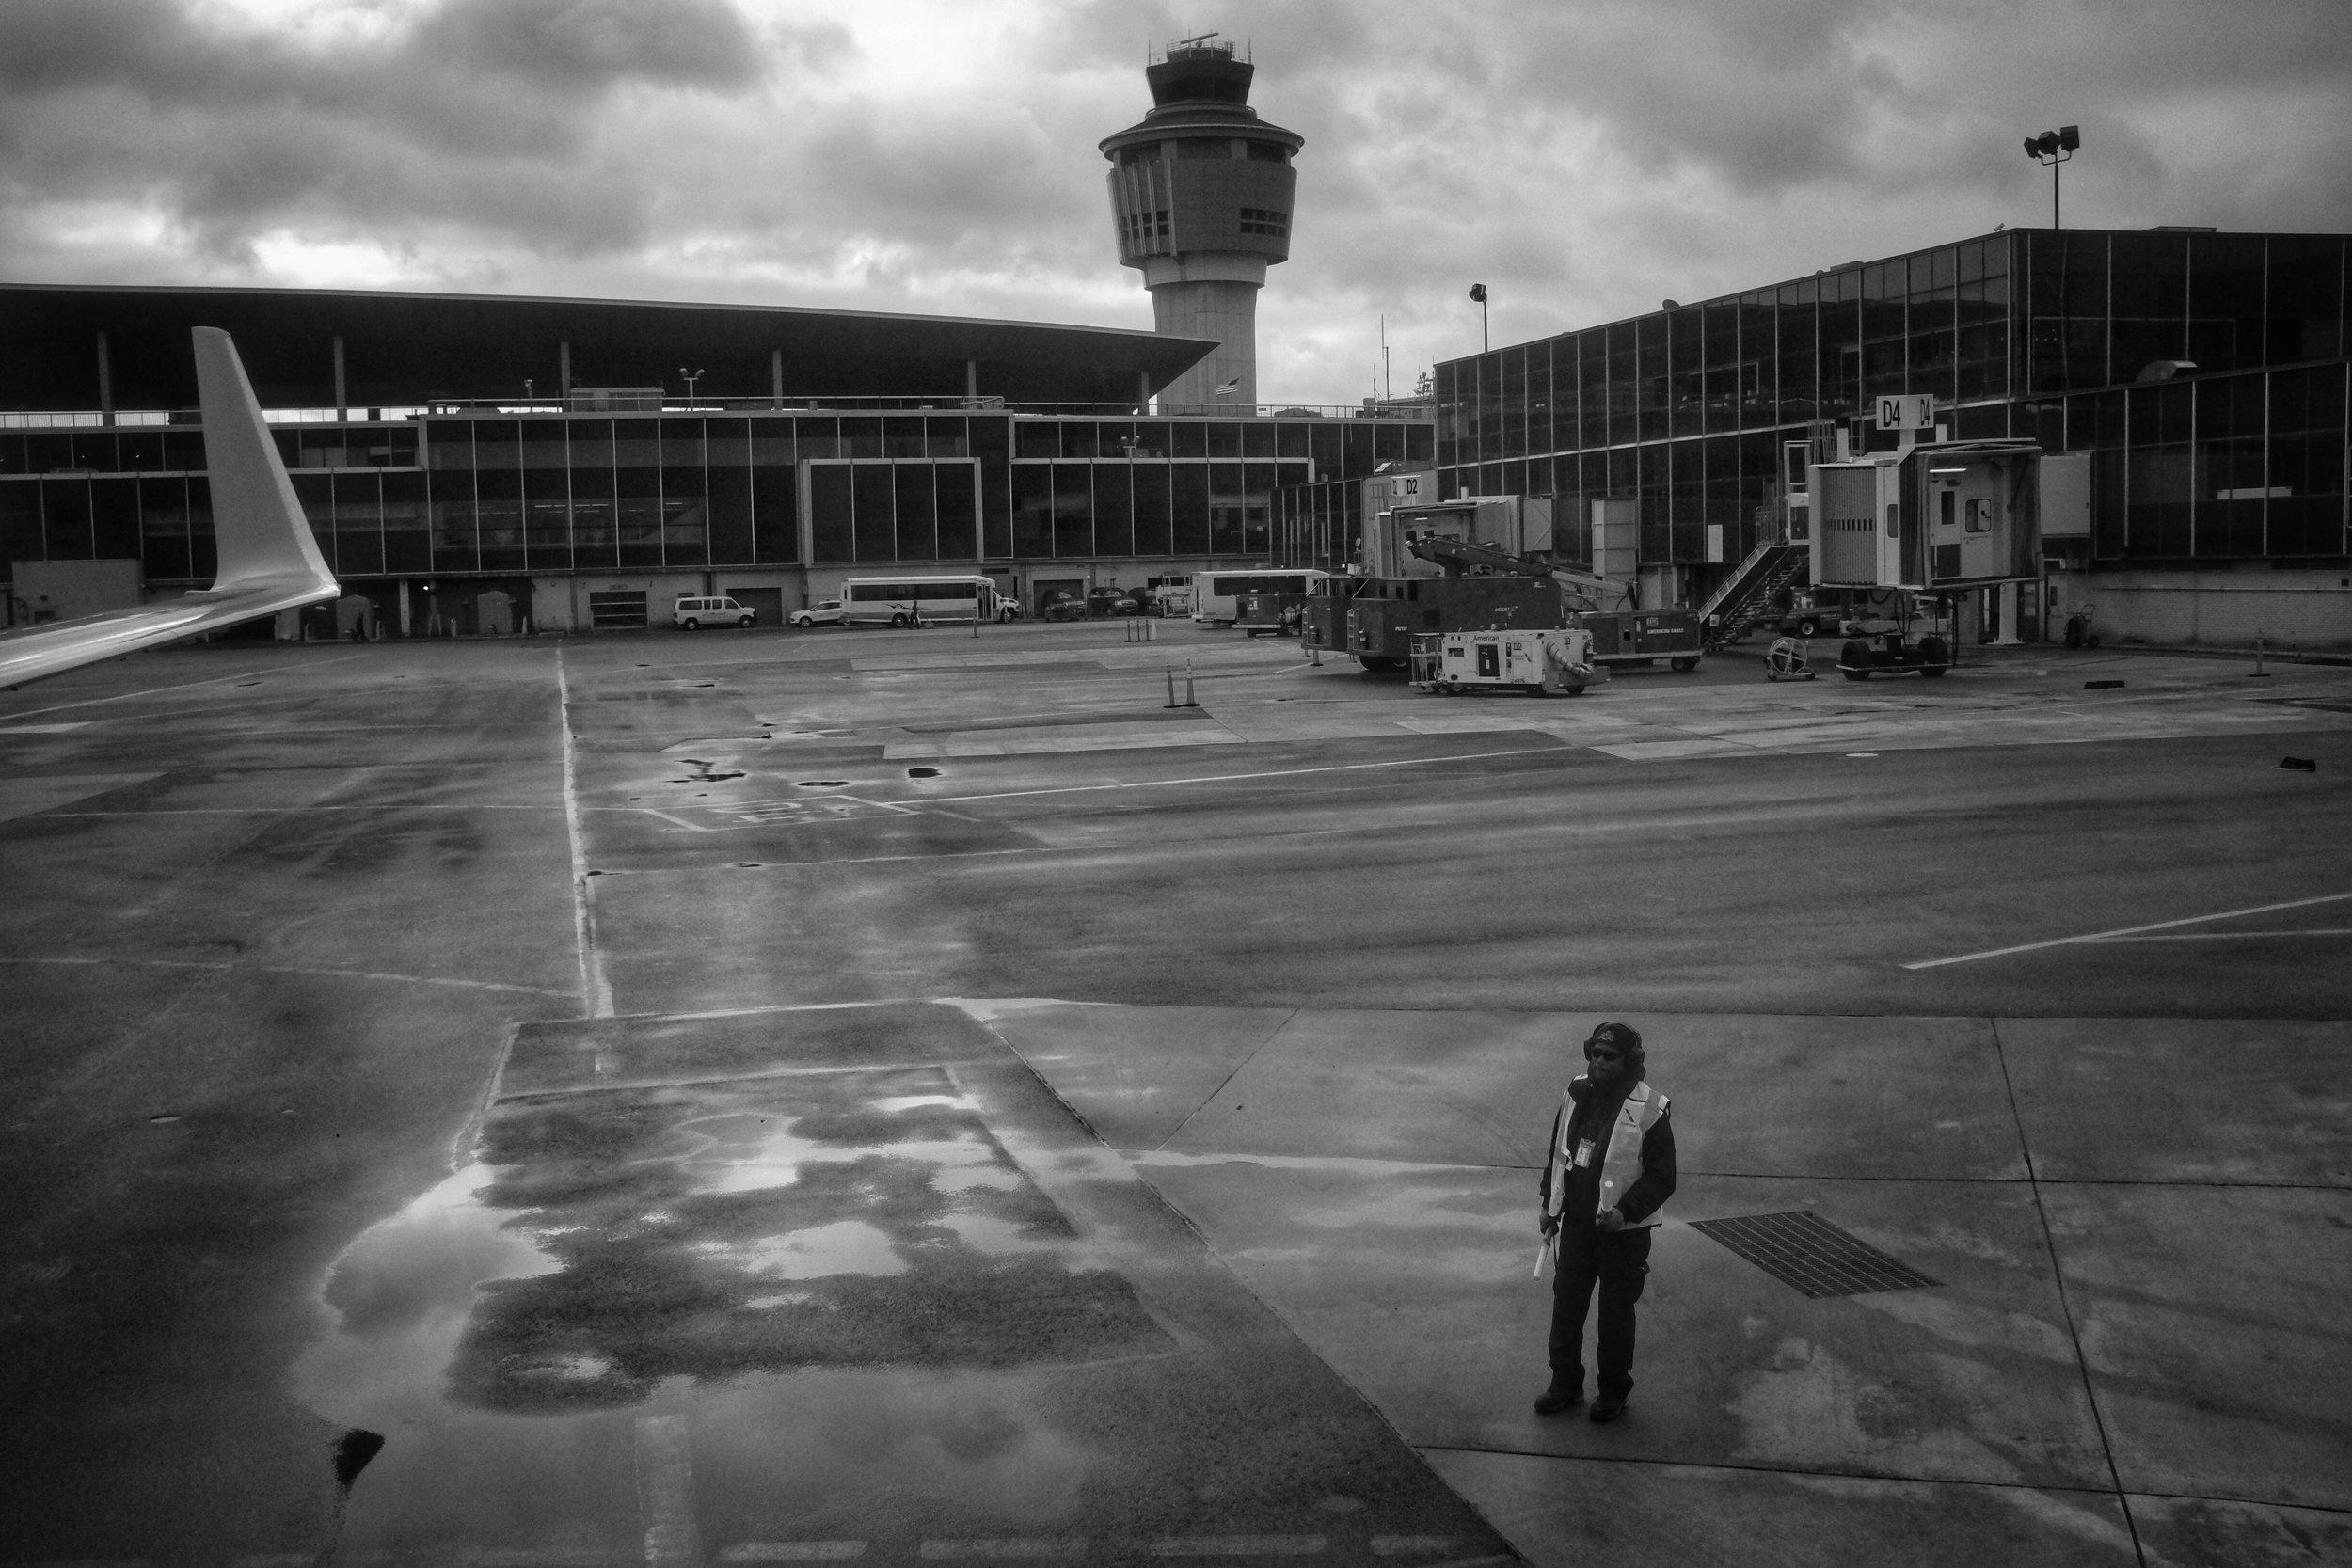 La Guardia Airport. Queens. New York. 2016